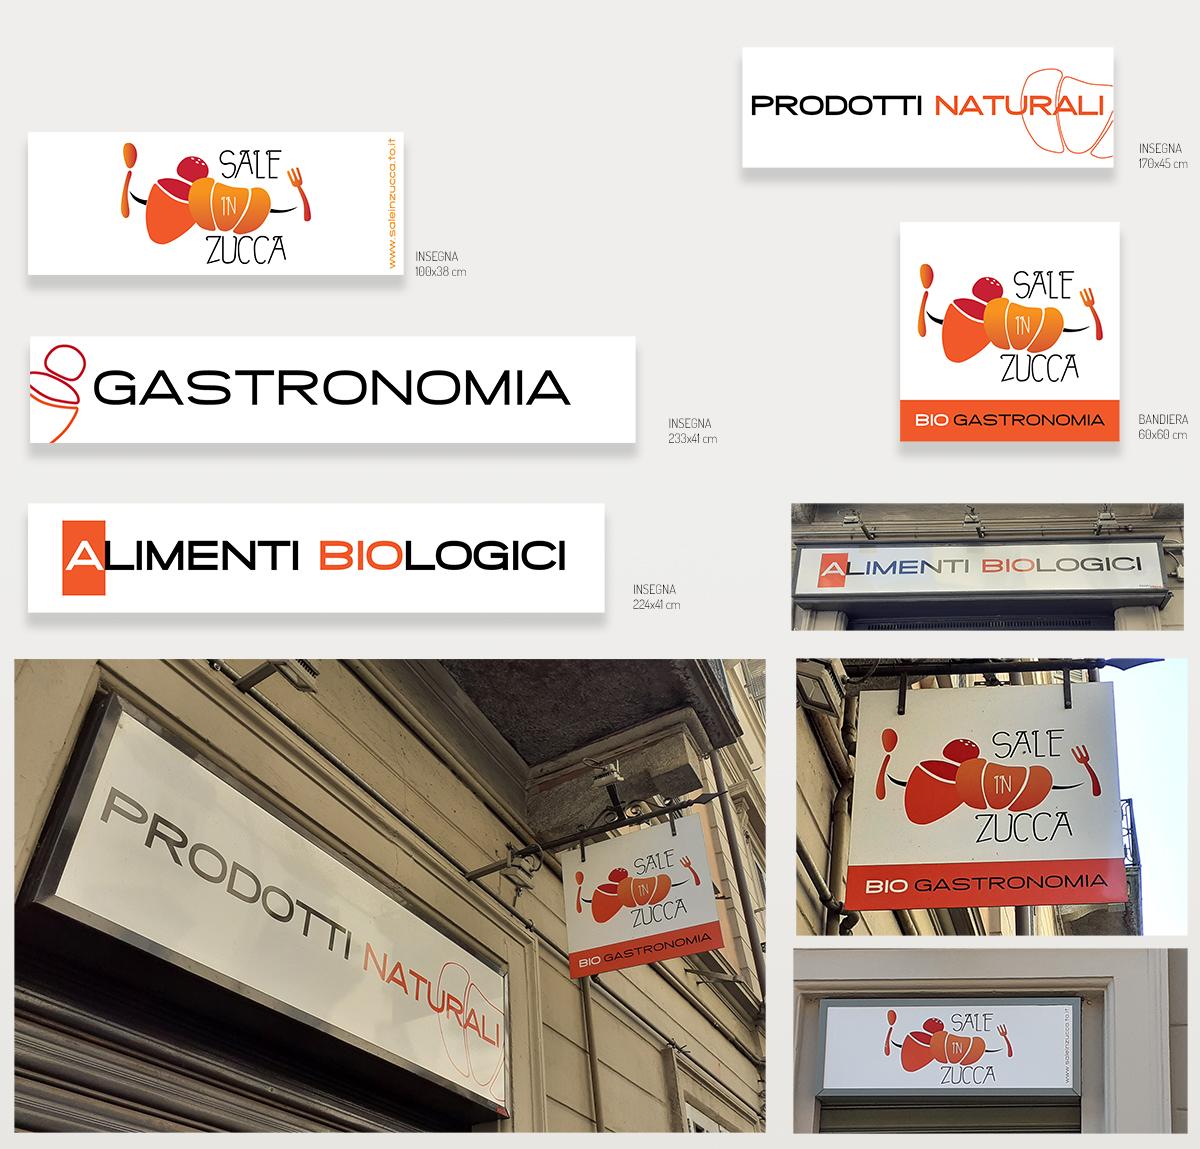 https://maxmaraucci.it/wp-content/uploads/2020/08/SaleInZucca_insegne_negozio.jpg